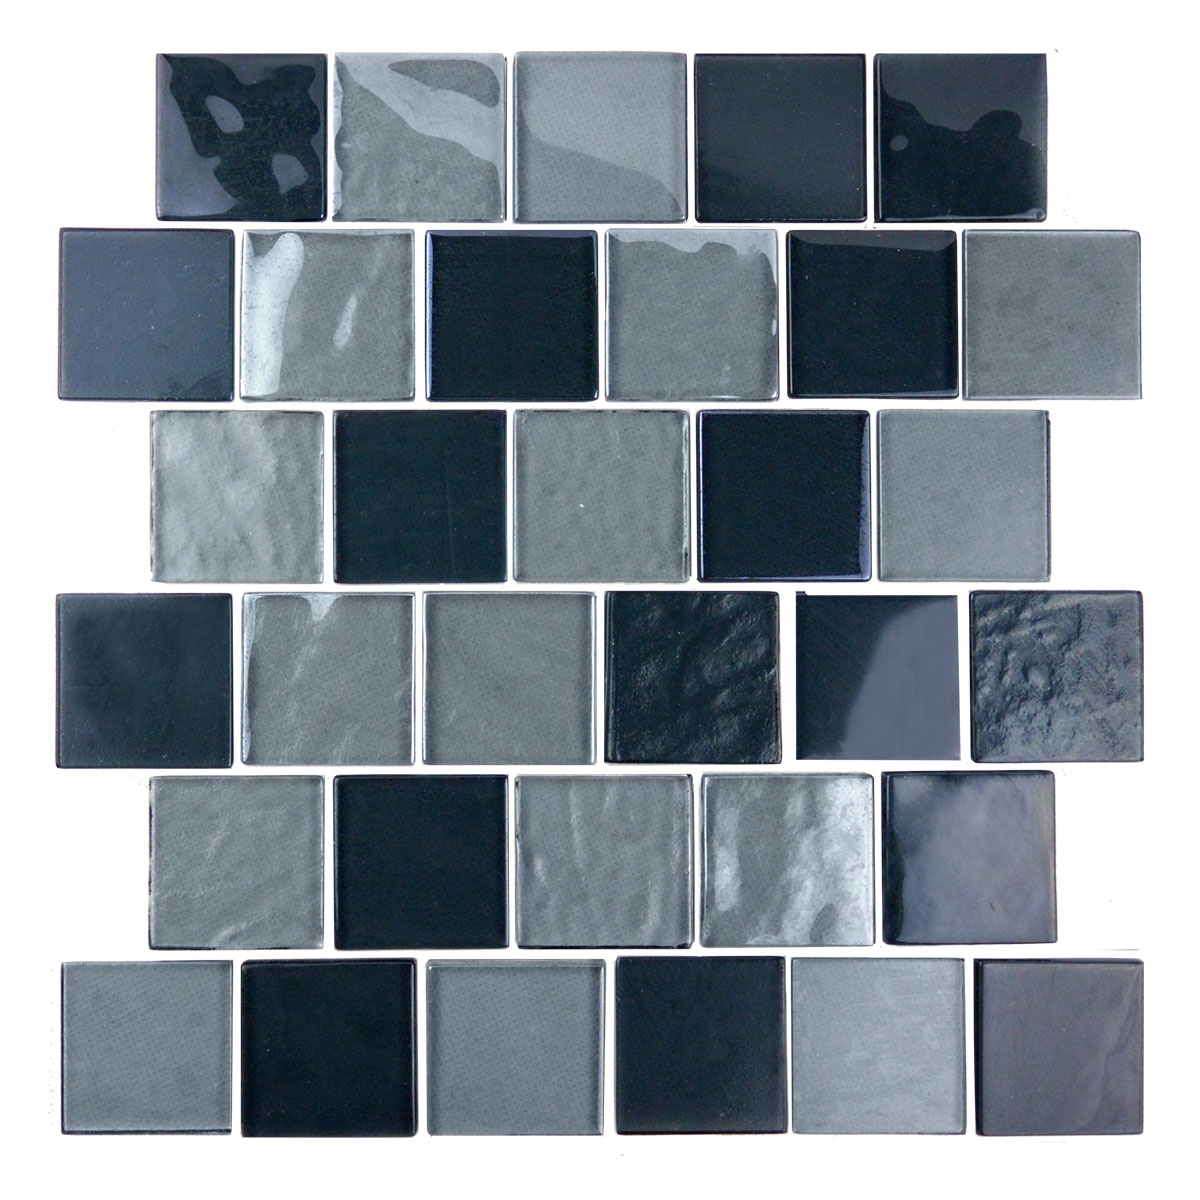 "Landscape 2"" x 2"" Textured Gray Glass Brick Backsplash Mosaic Wall & Floor Tile"